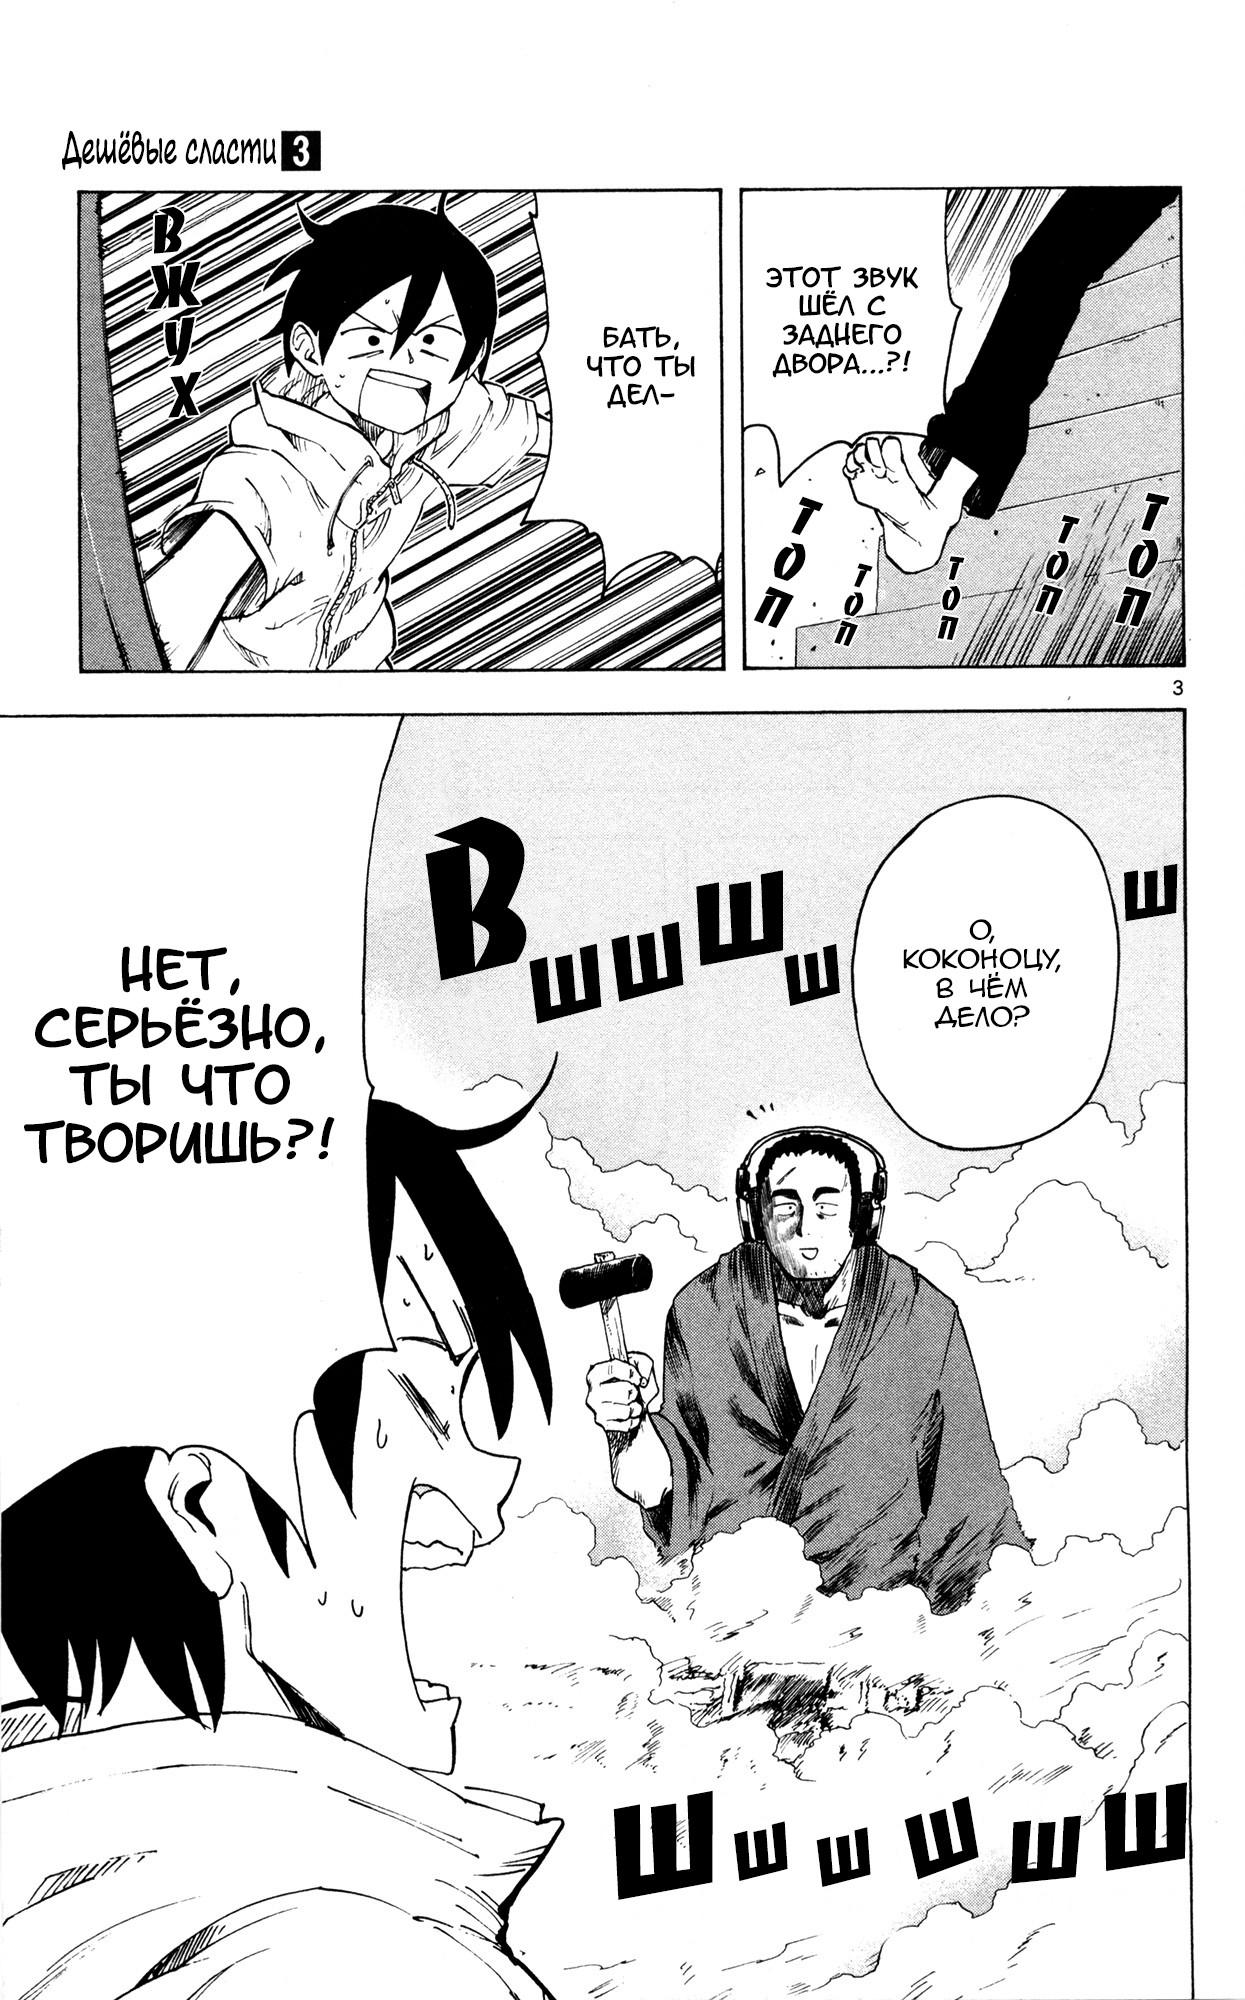 https://r1.ninemanga.com/comics/pic2/52/27572/411214/152281470745.jpg Page 3